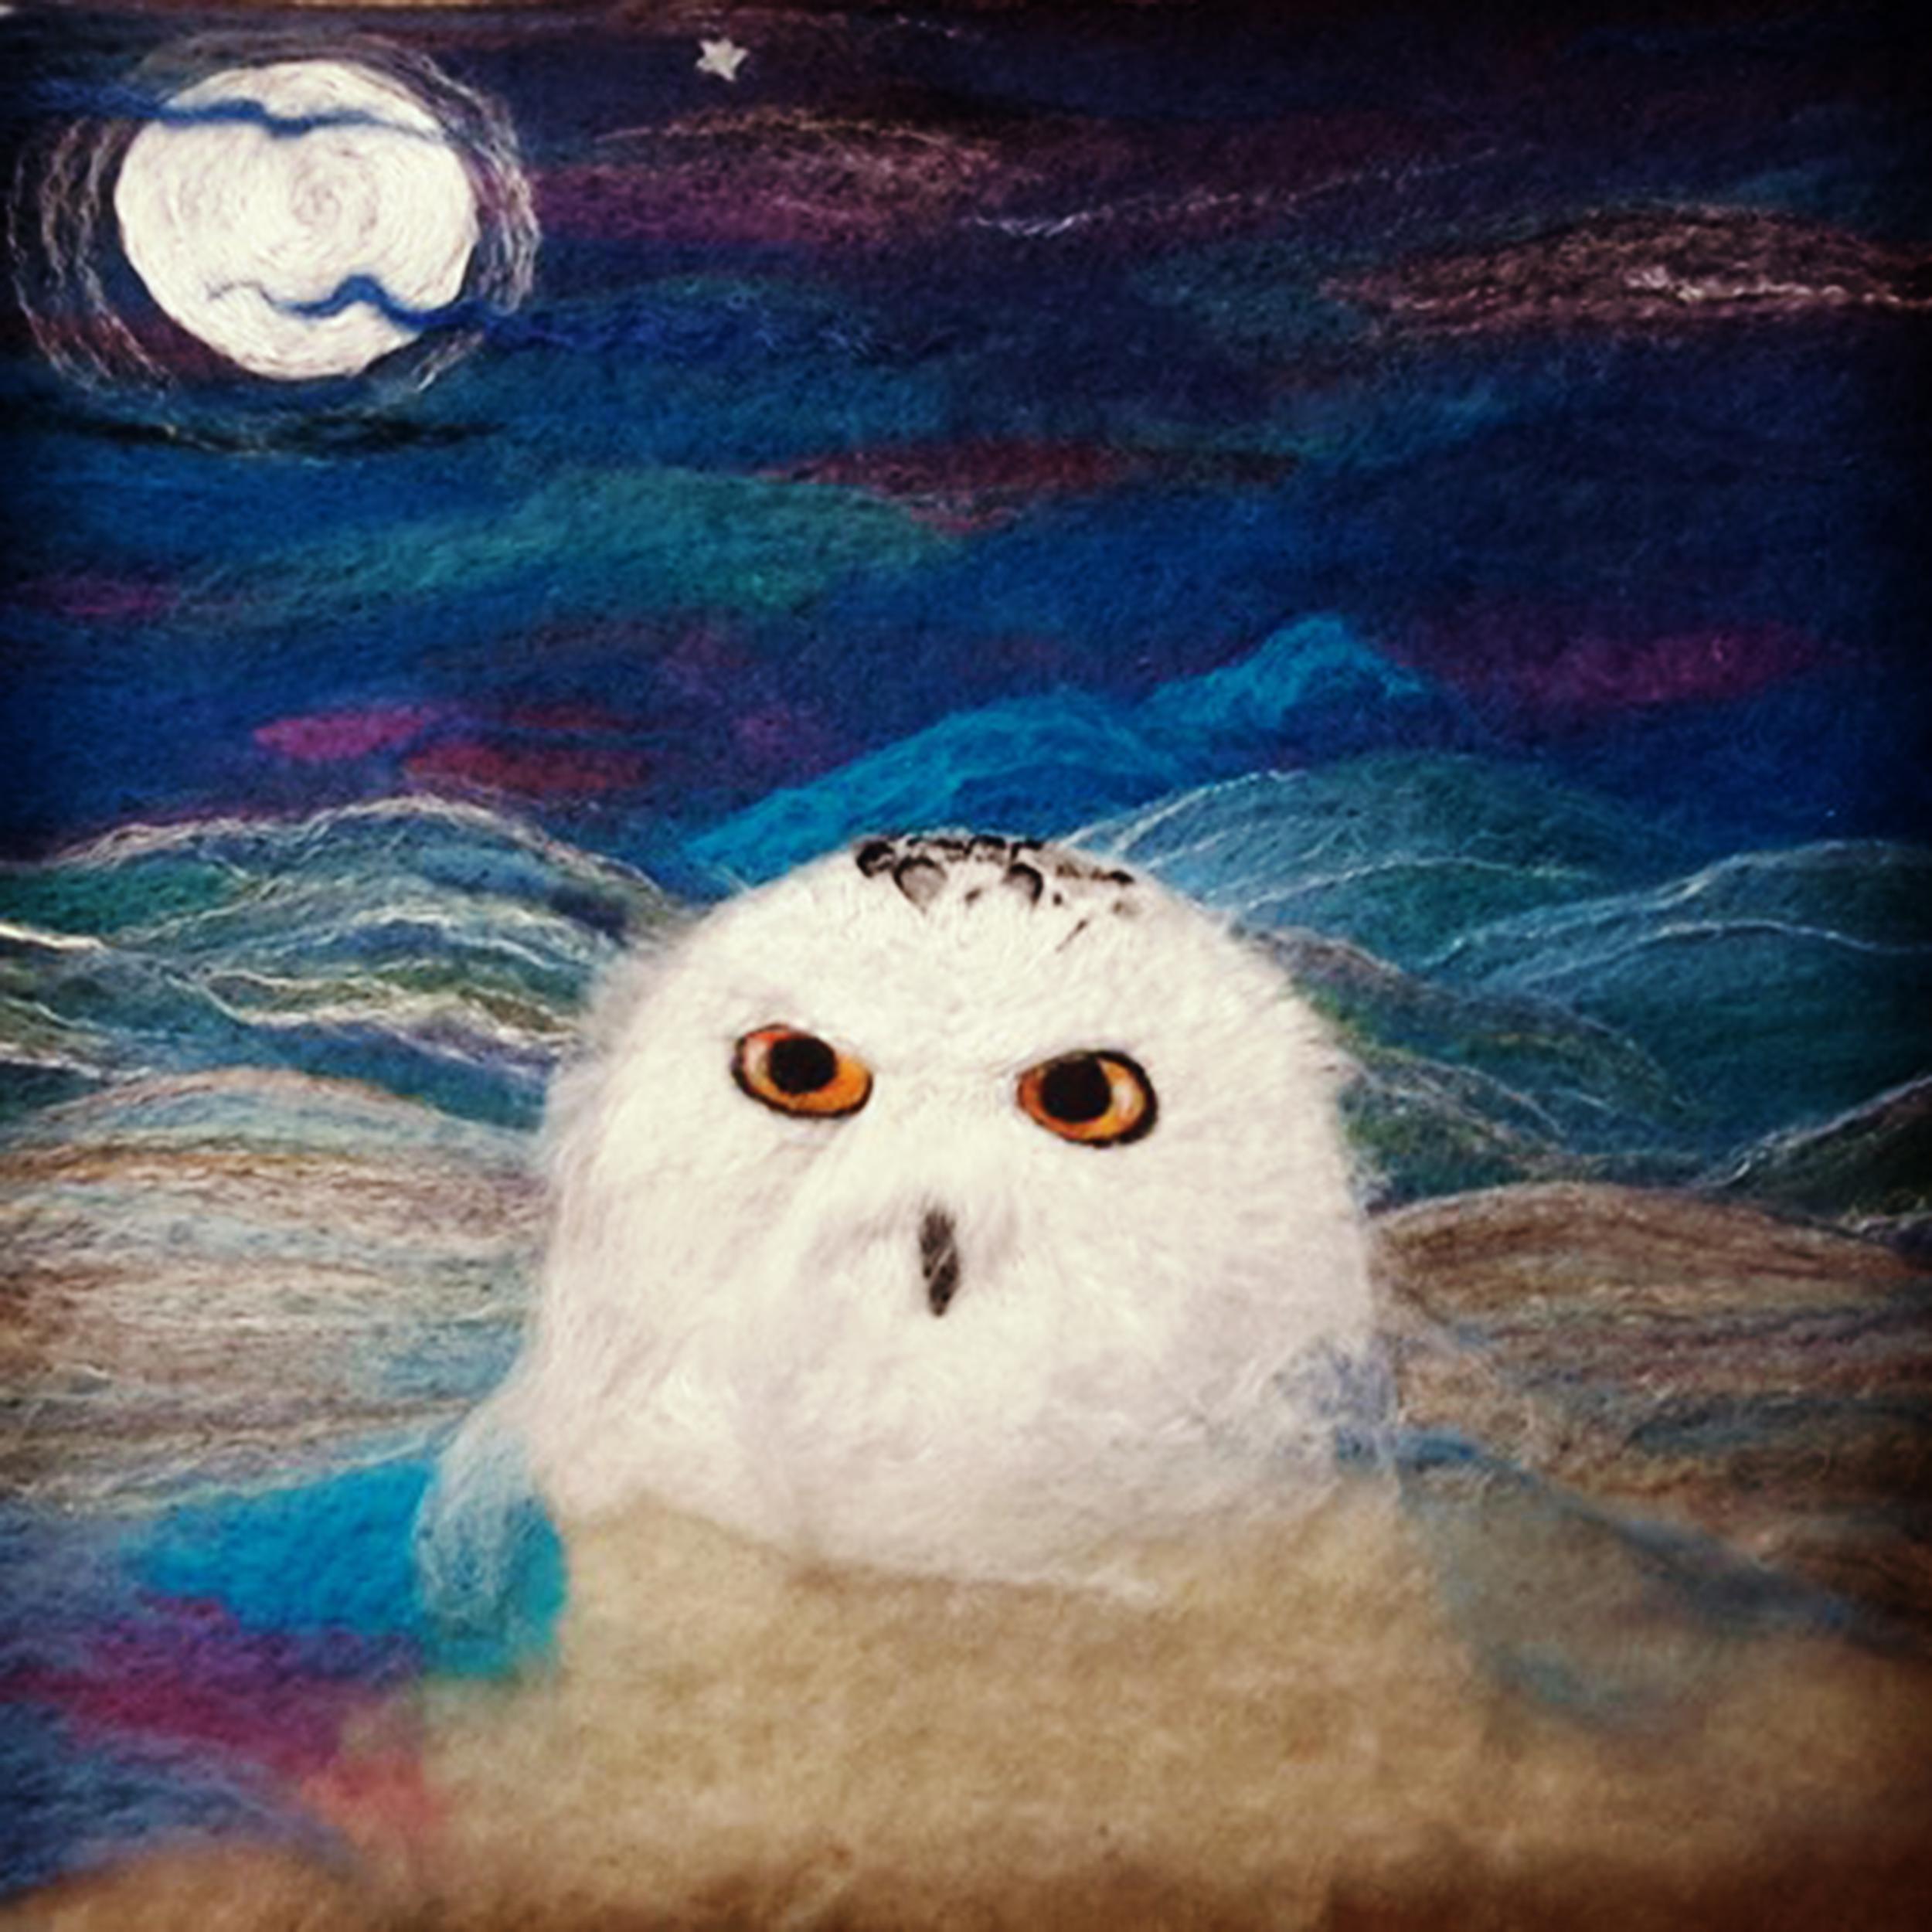 WiP owl tapestry